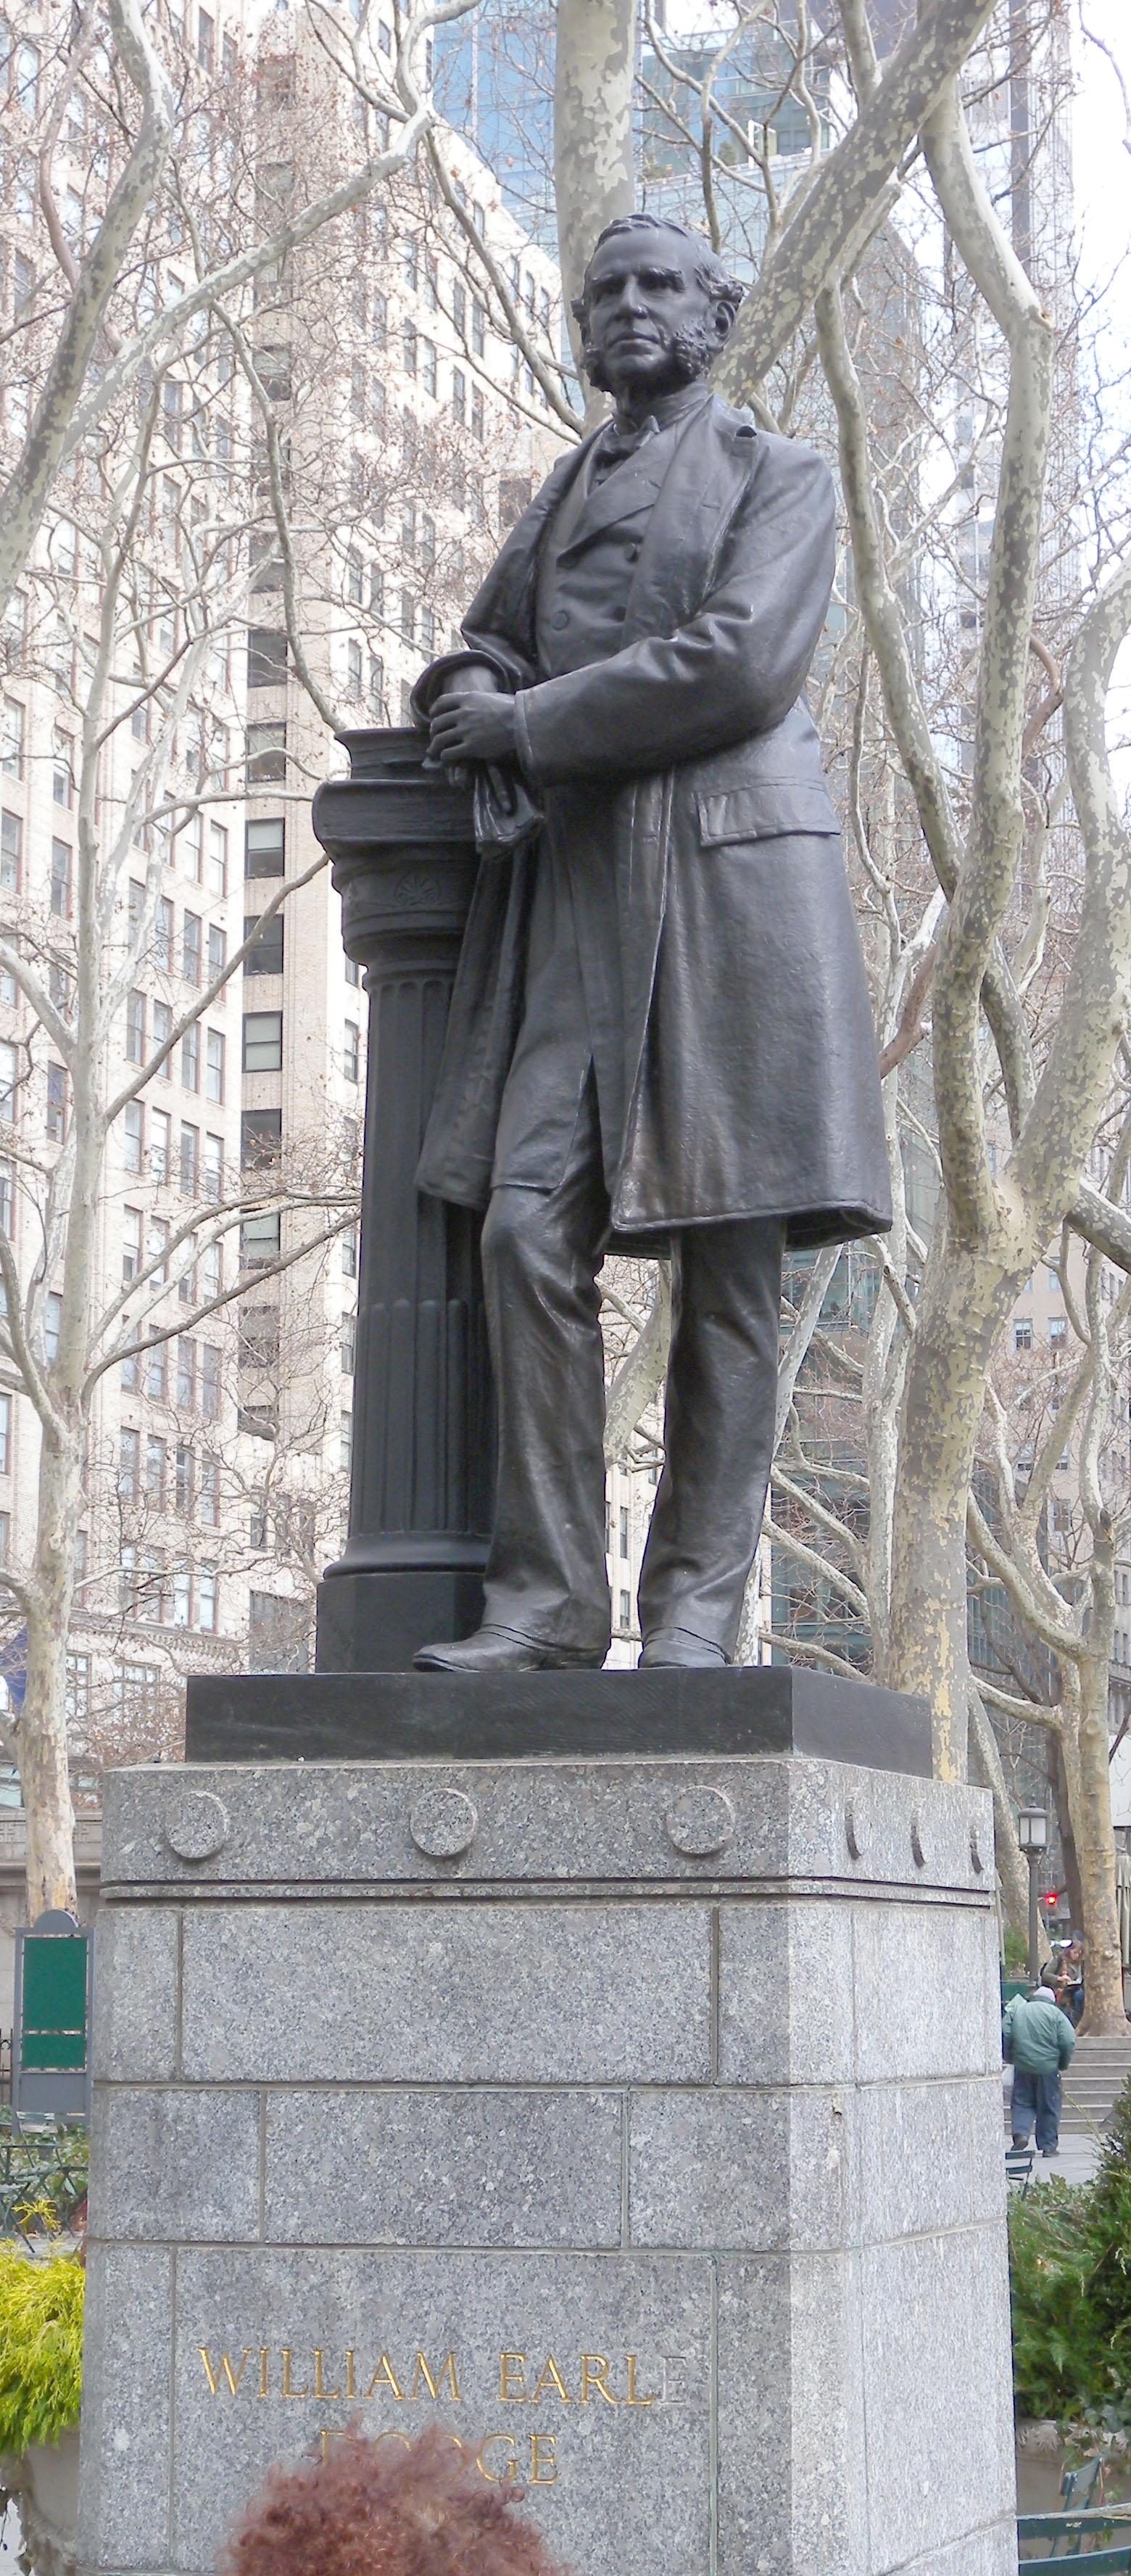 Human, Sculpture, Standing, Memorial